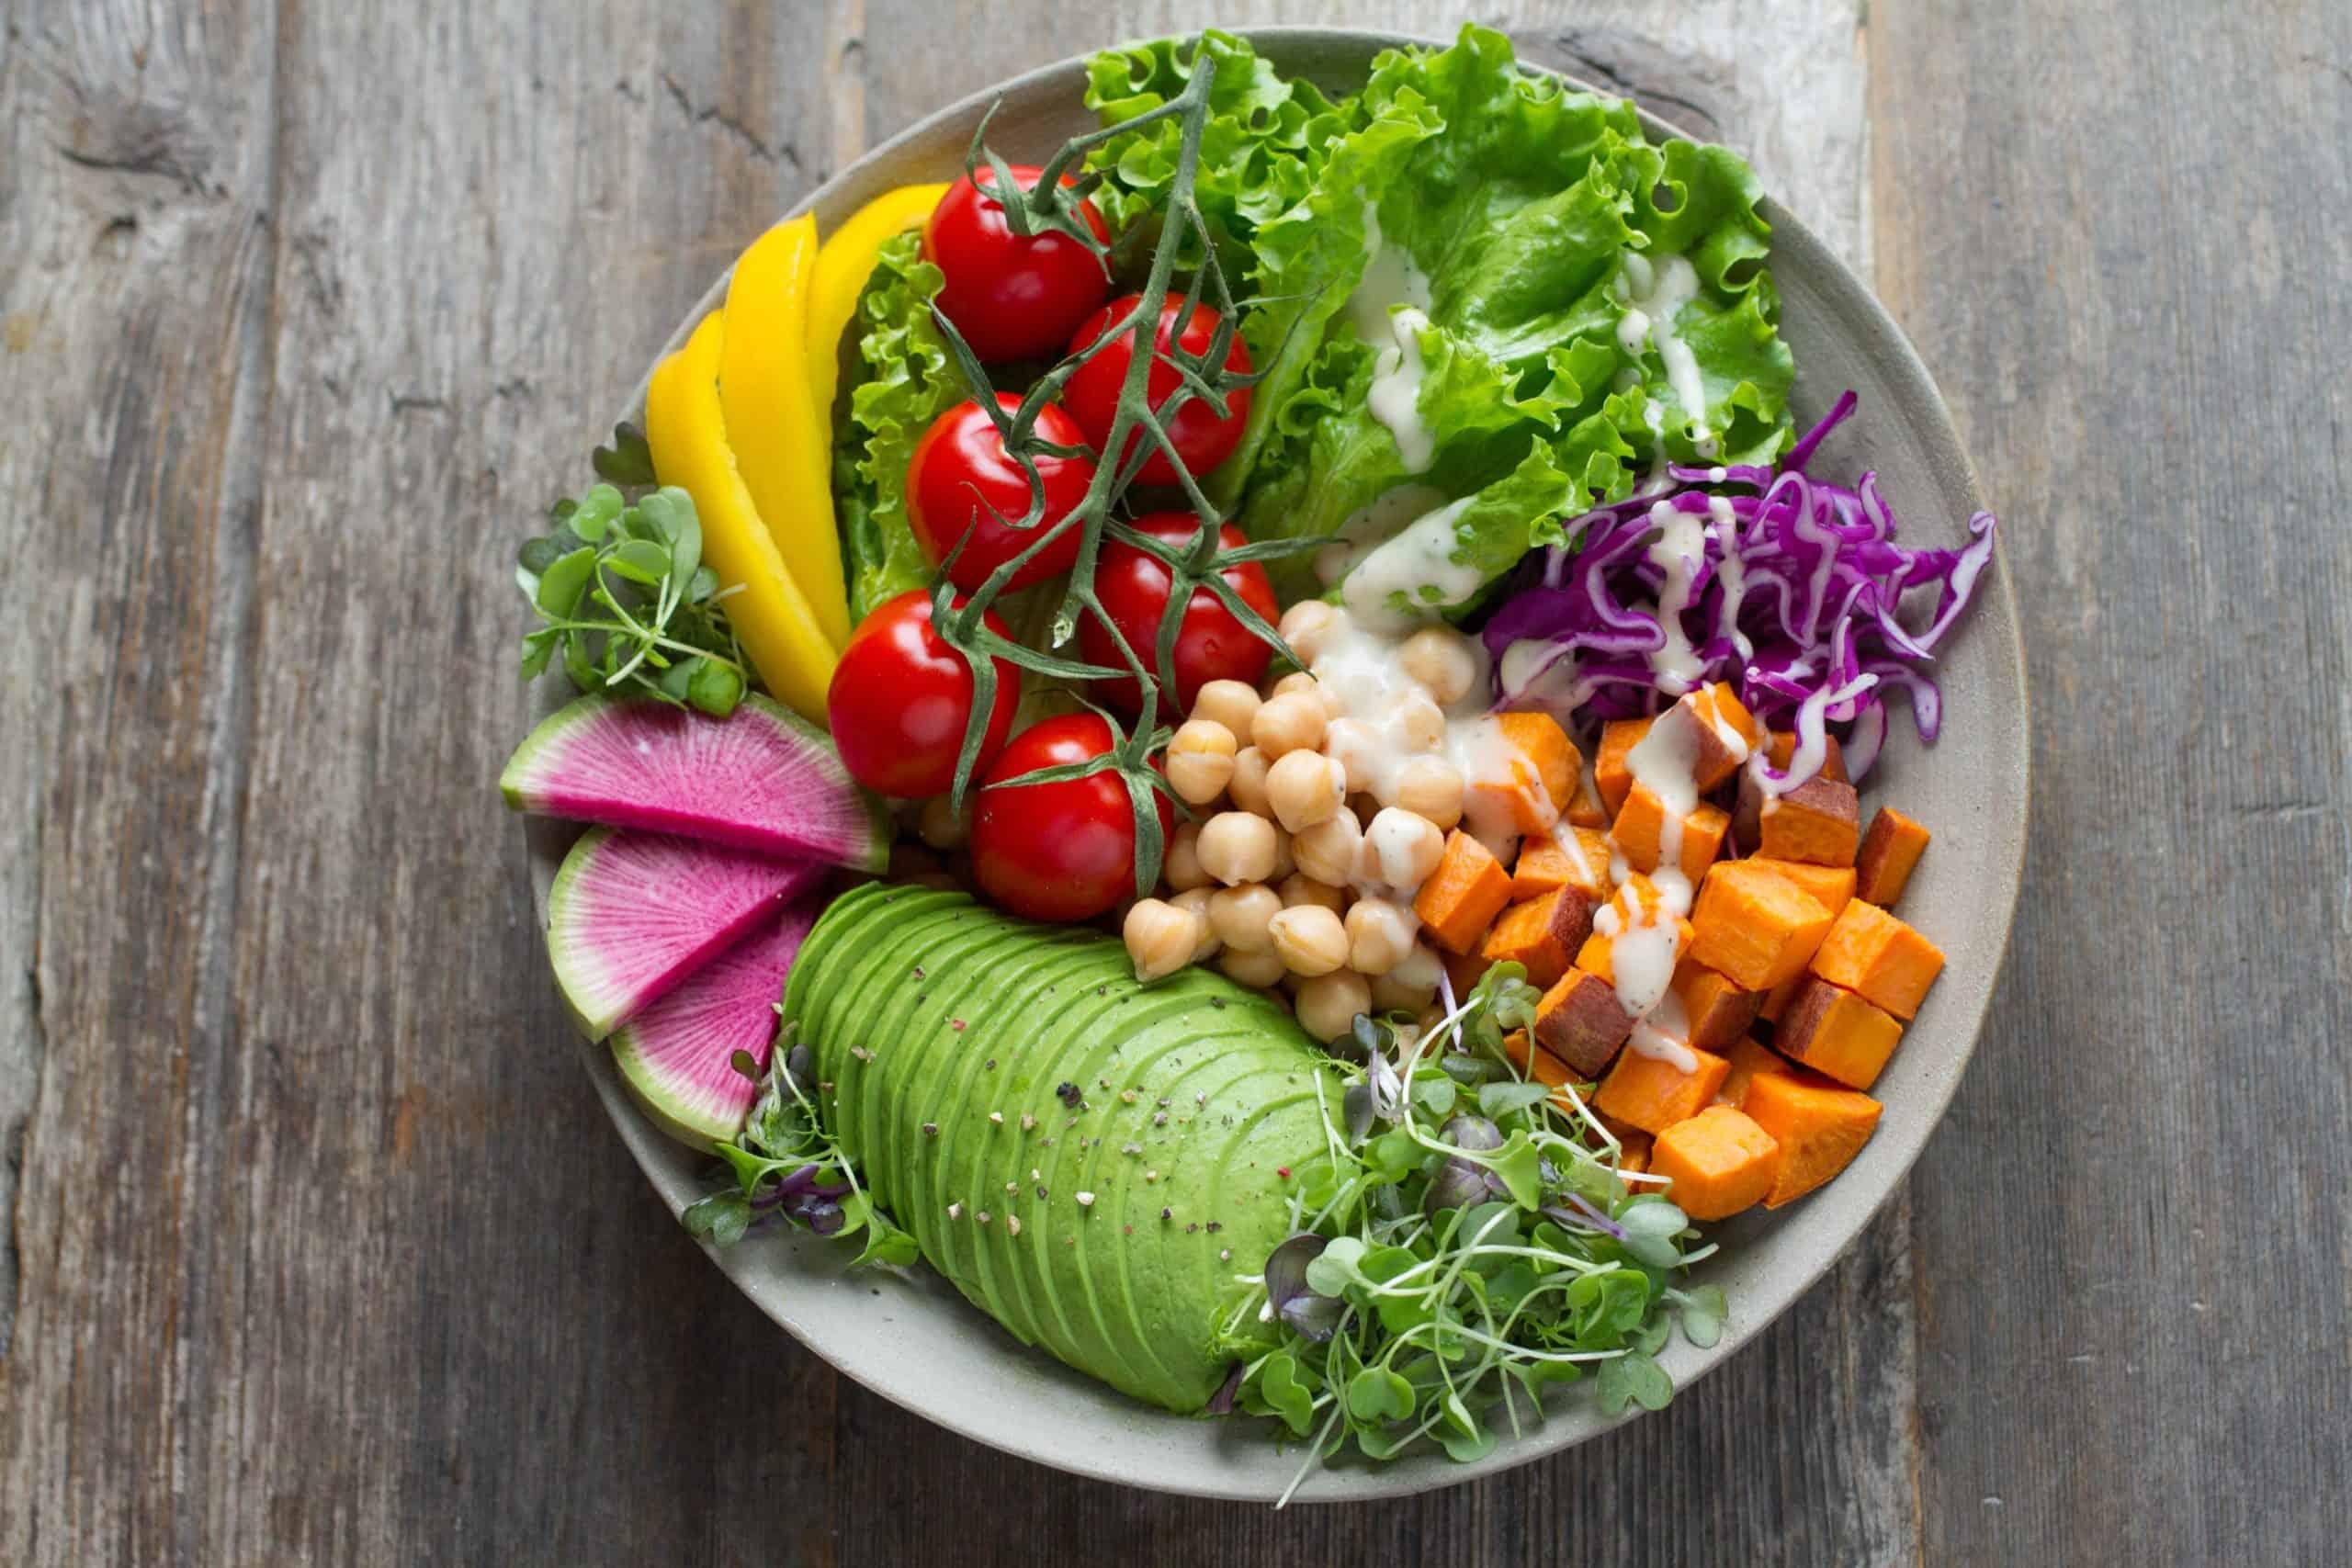 Best Vegan Nutrition course tutorial class certification training online